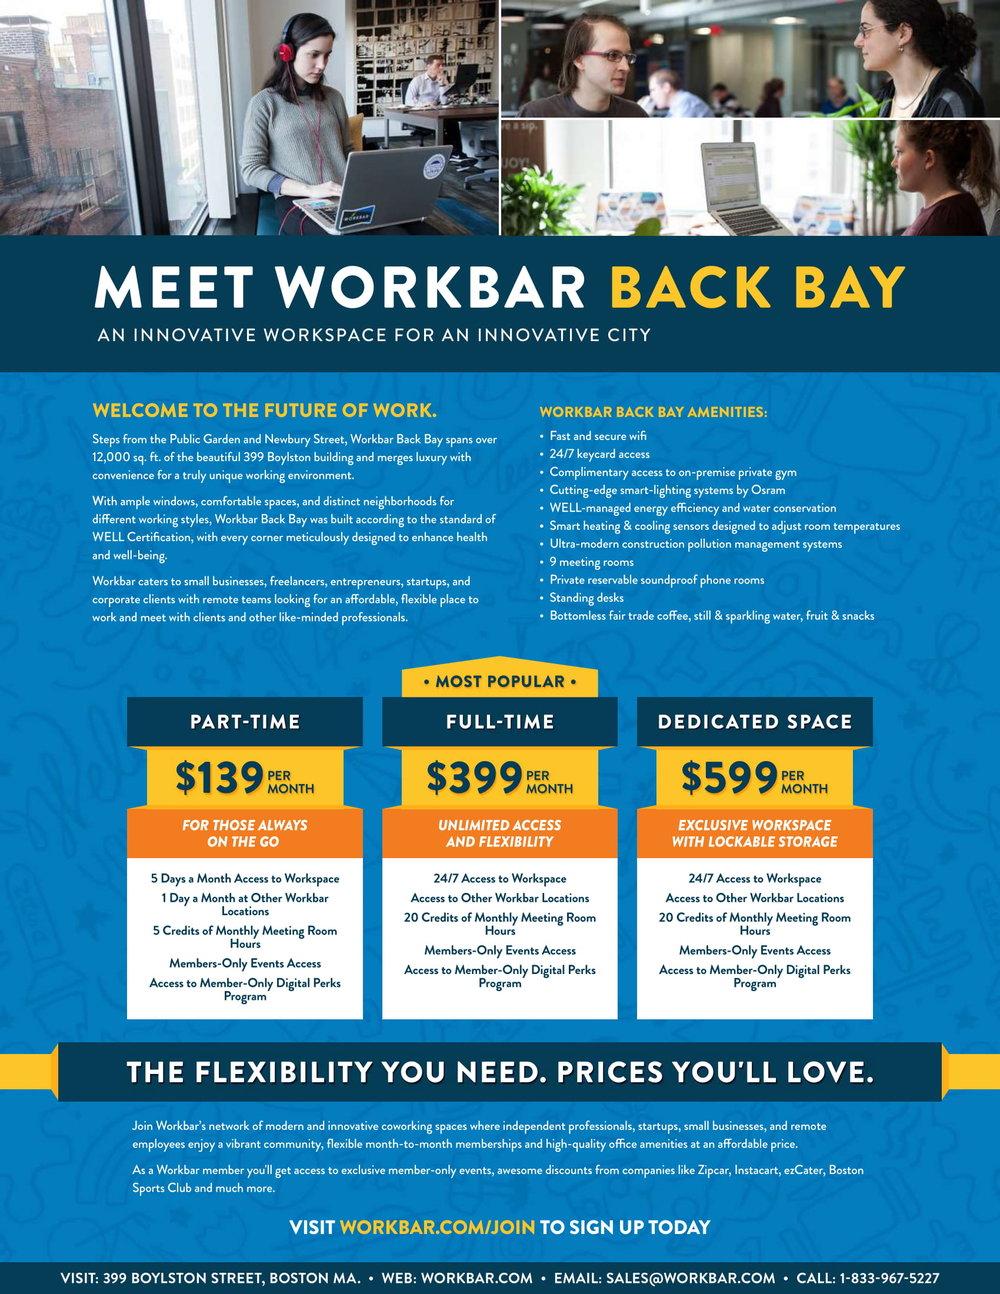 Workbar Back Bay - Digital-1.jpg